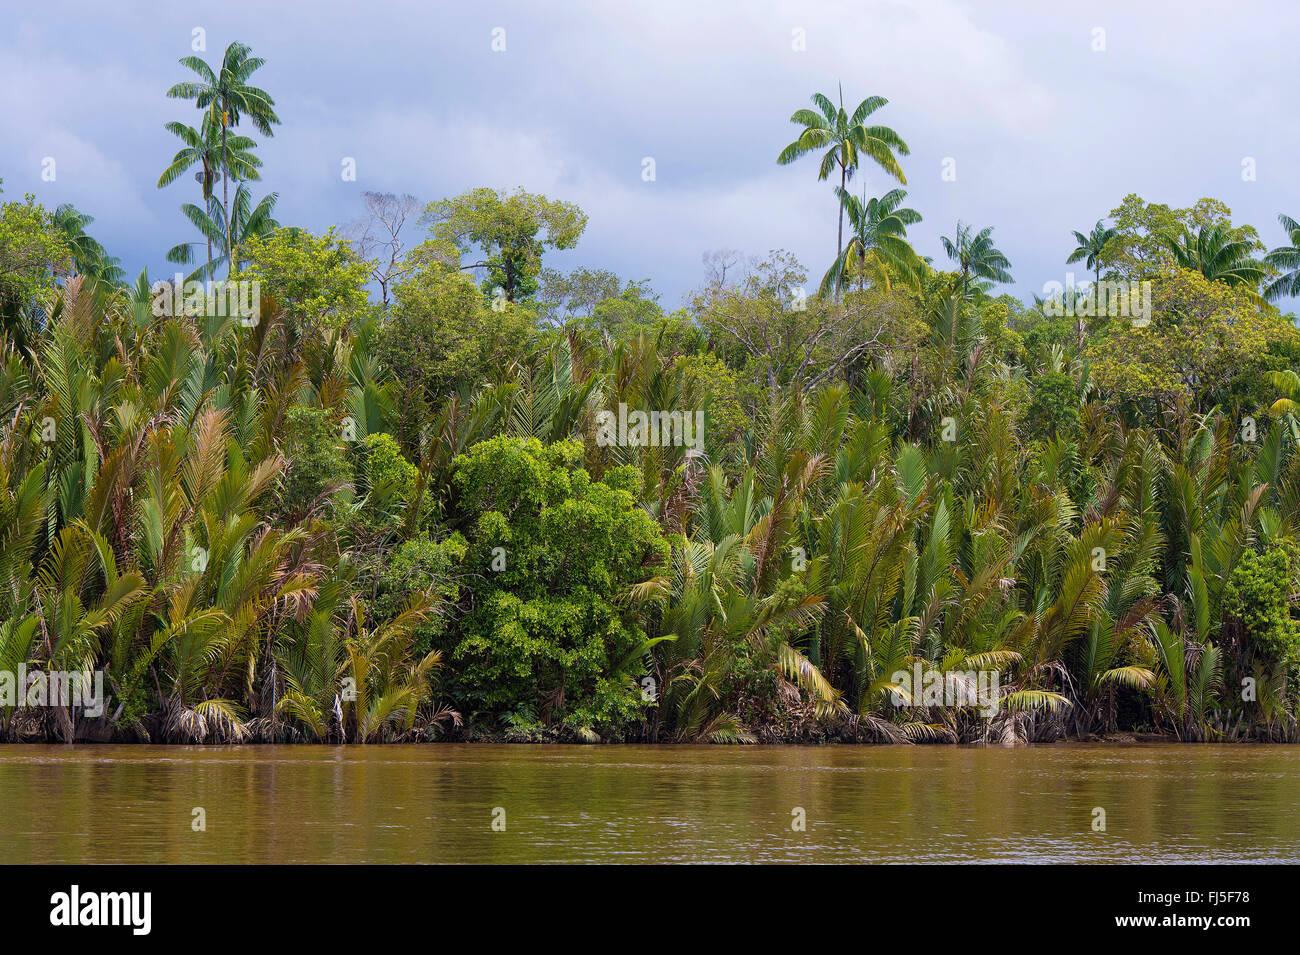 nipa palm (Nypa frutians), Dense and diverse vegetation along the banks of Kinabatangan River, Malaysia, Borneo, - Stock Image